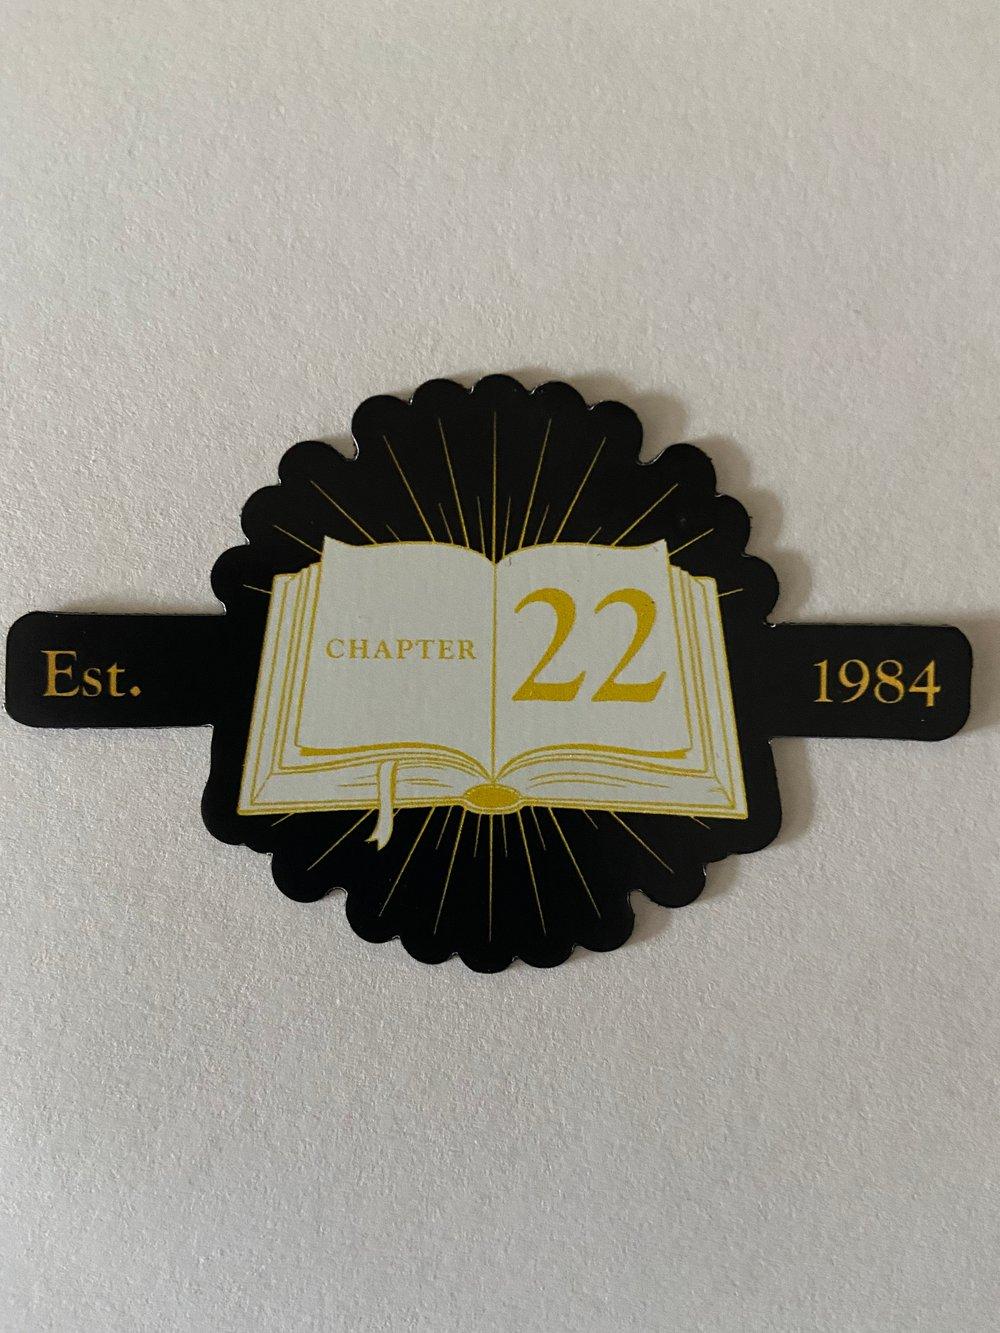 Image of Chapter 22 fridge magnet